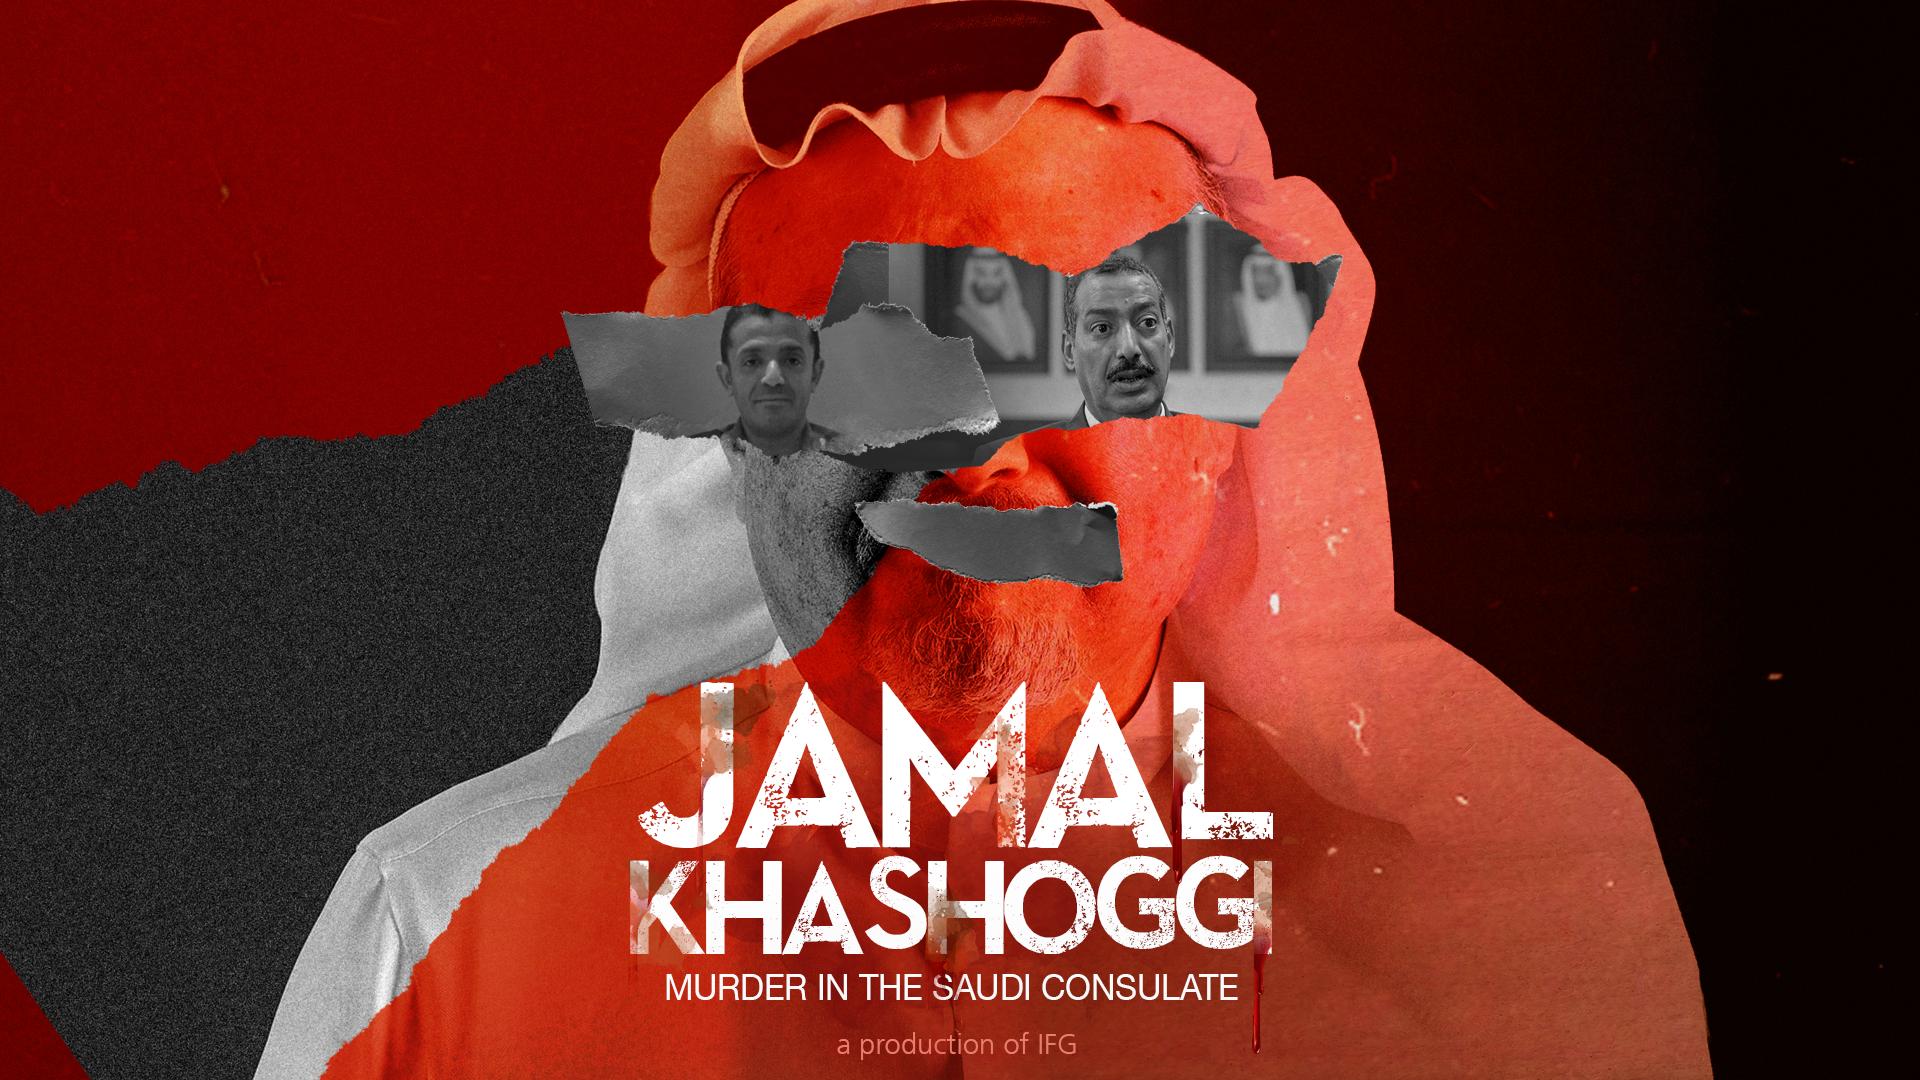 Jamal Khashoggi: Murder in the Saudi Consulate